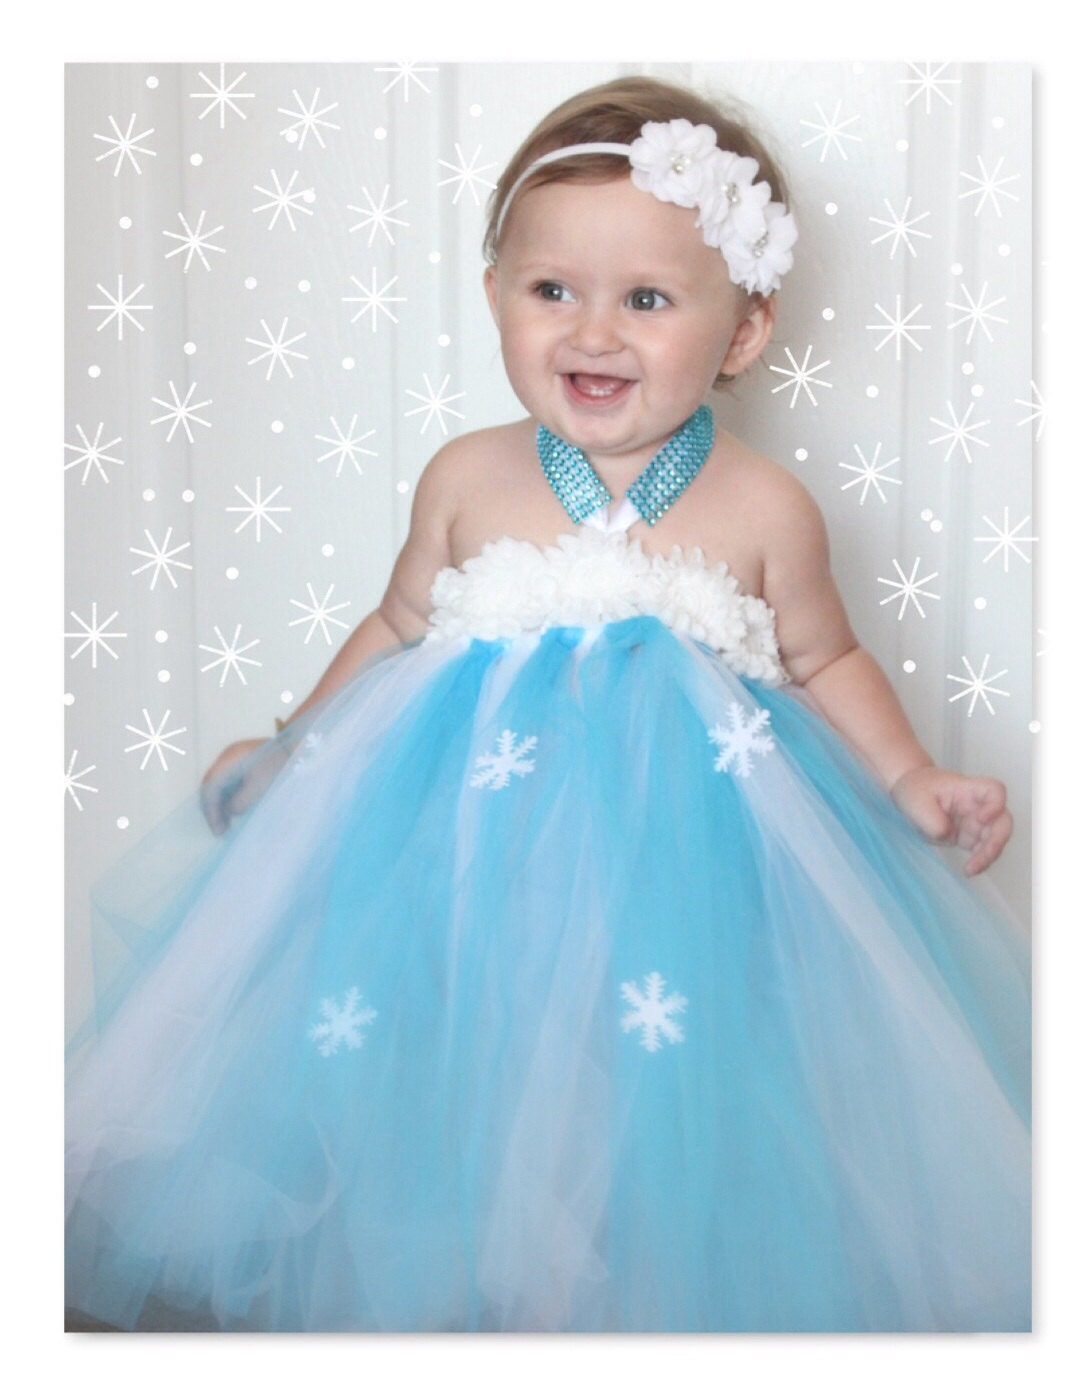 Baby Frozen Tutu Dress Frozen Costume Snowflake Winter